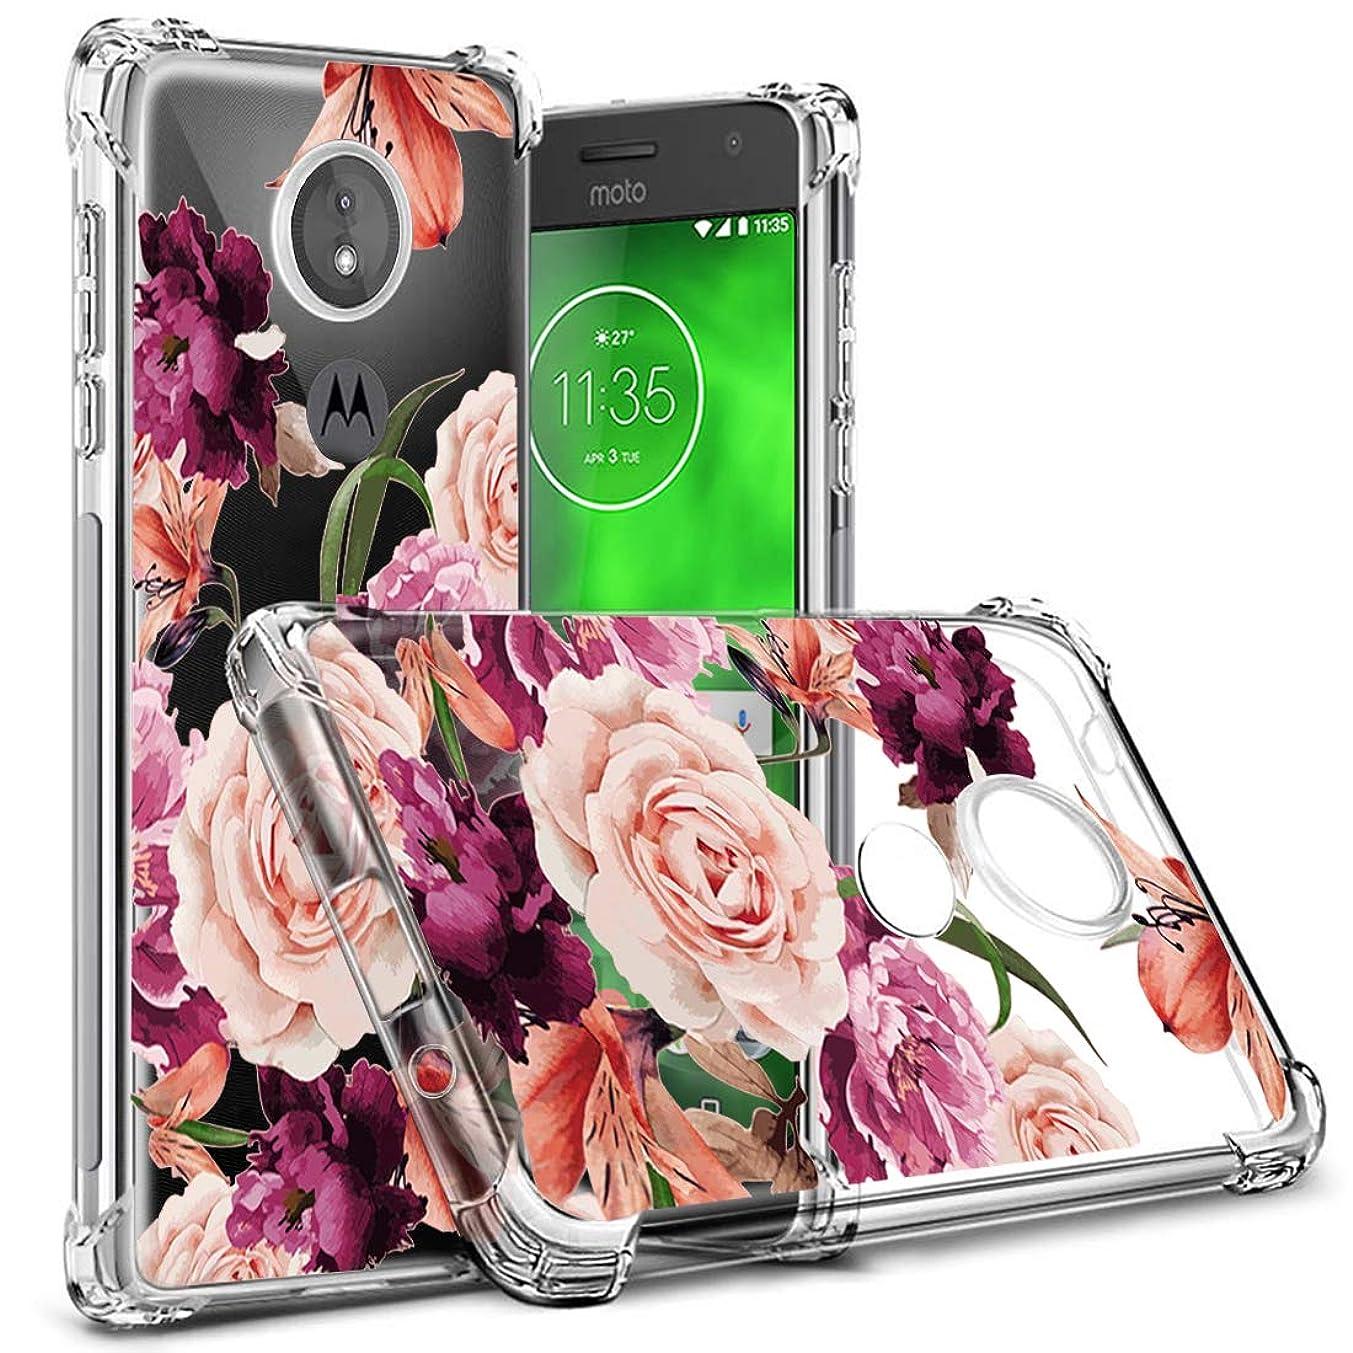 Moto G7 Power Case,Motorola Moto G7 Power XT1955-2 Flower Floral Cases,Osophter Shock-Absorption Flexible TPU Rubber Soft Cell Phone Cover for Moto G7 Power(Clear Flower